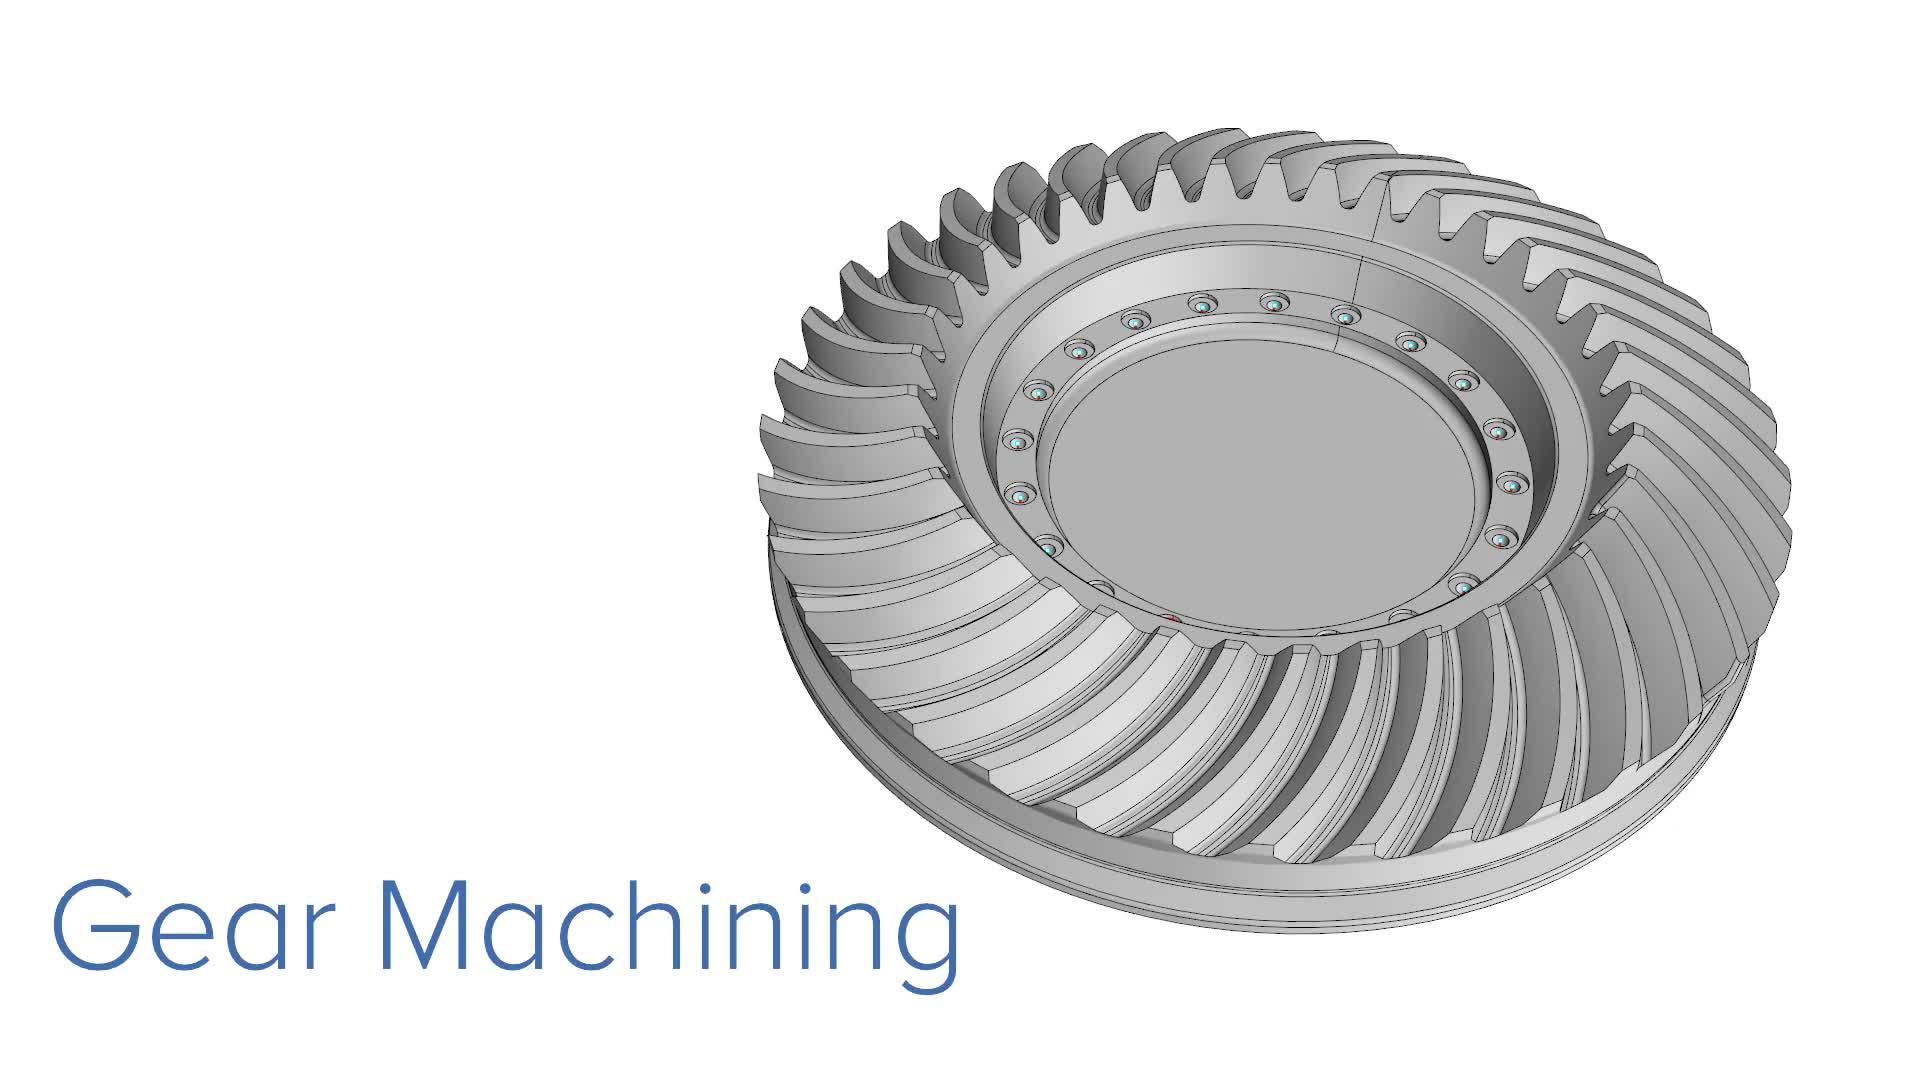 Gear Machining